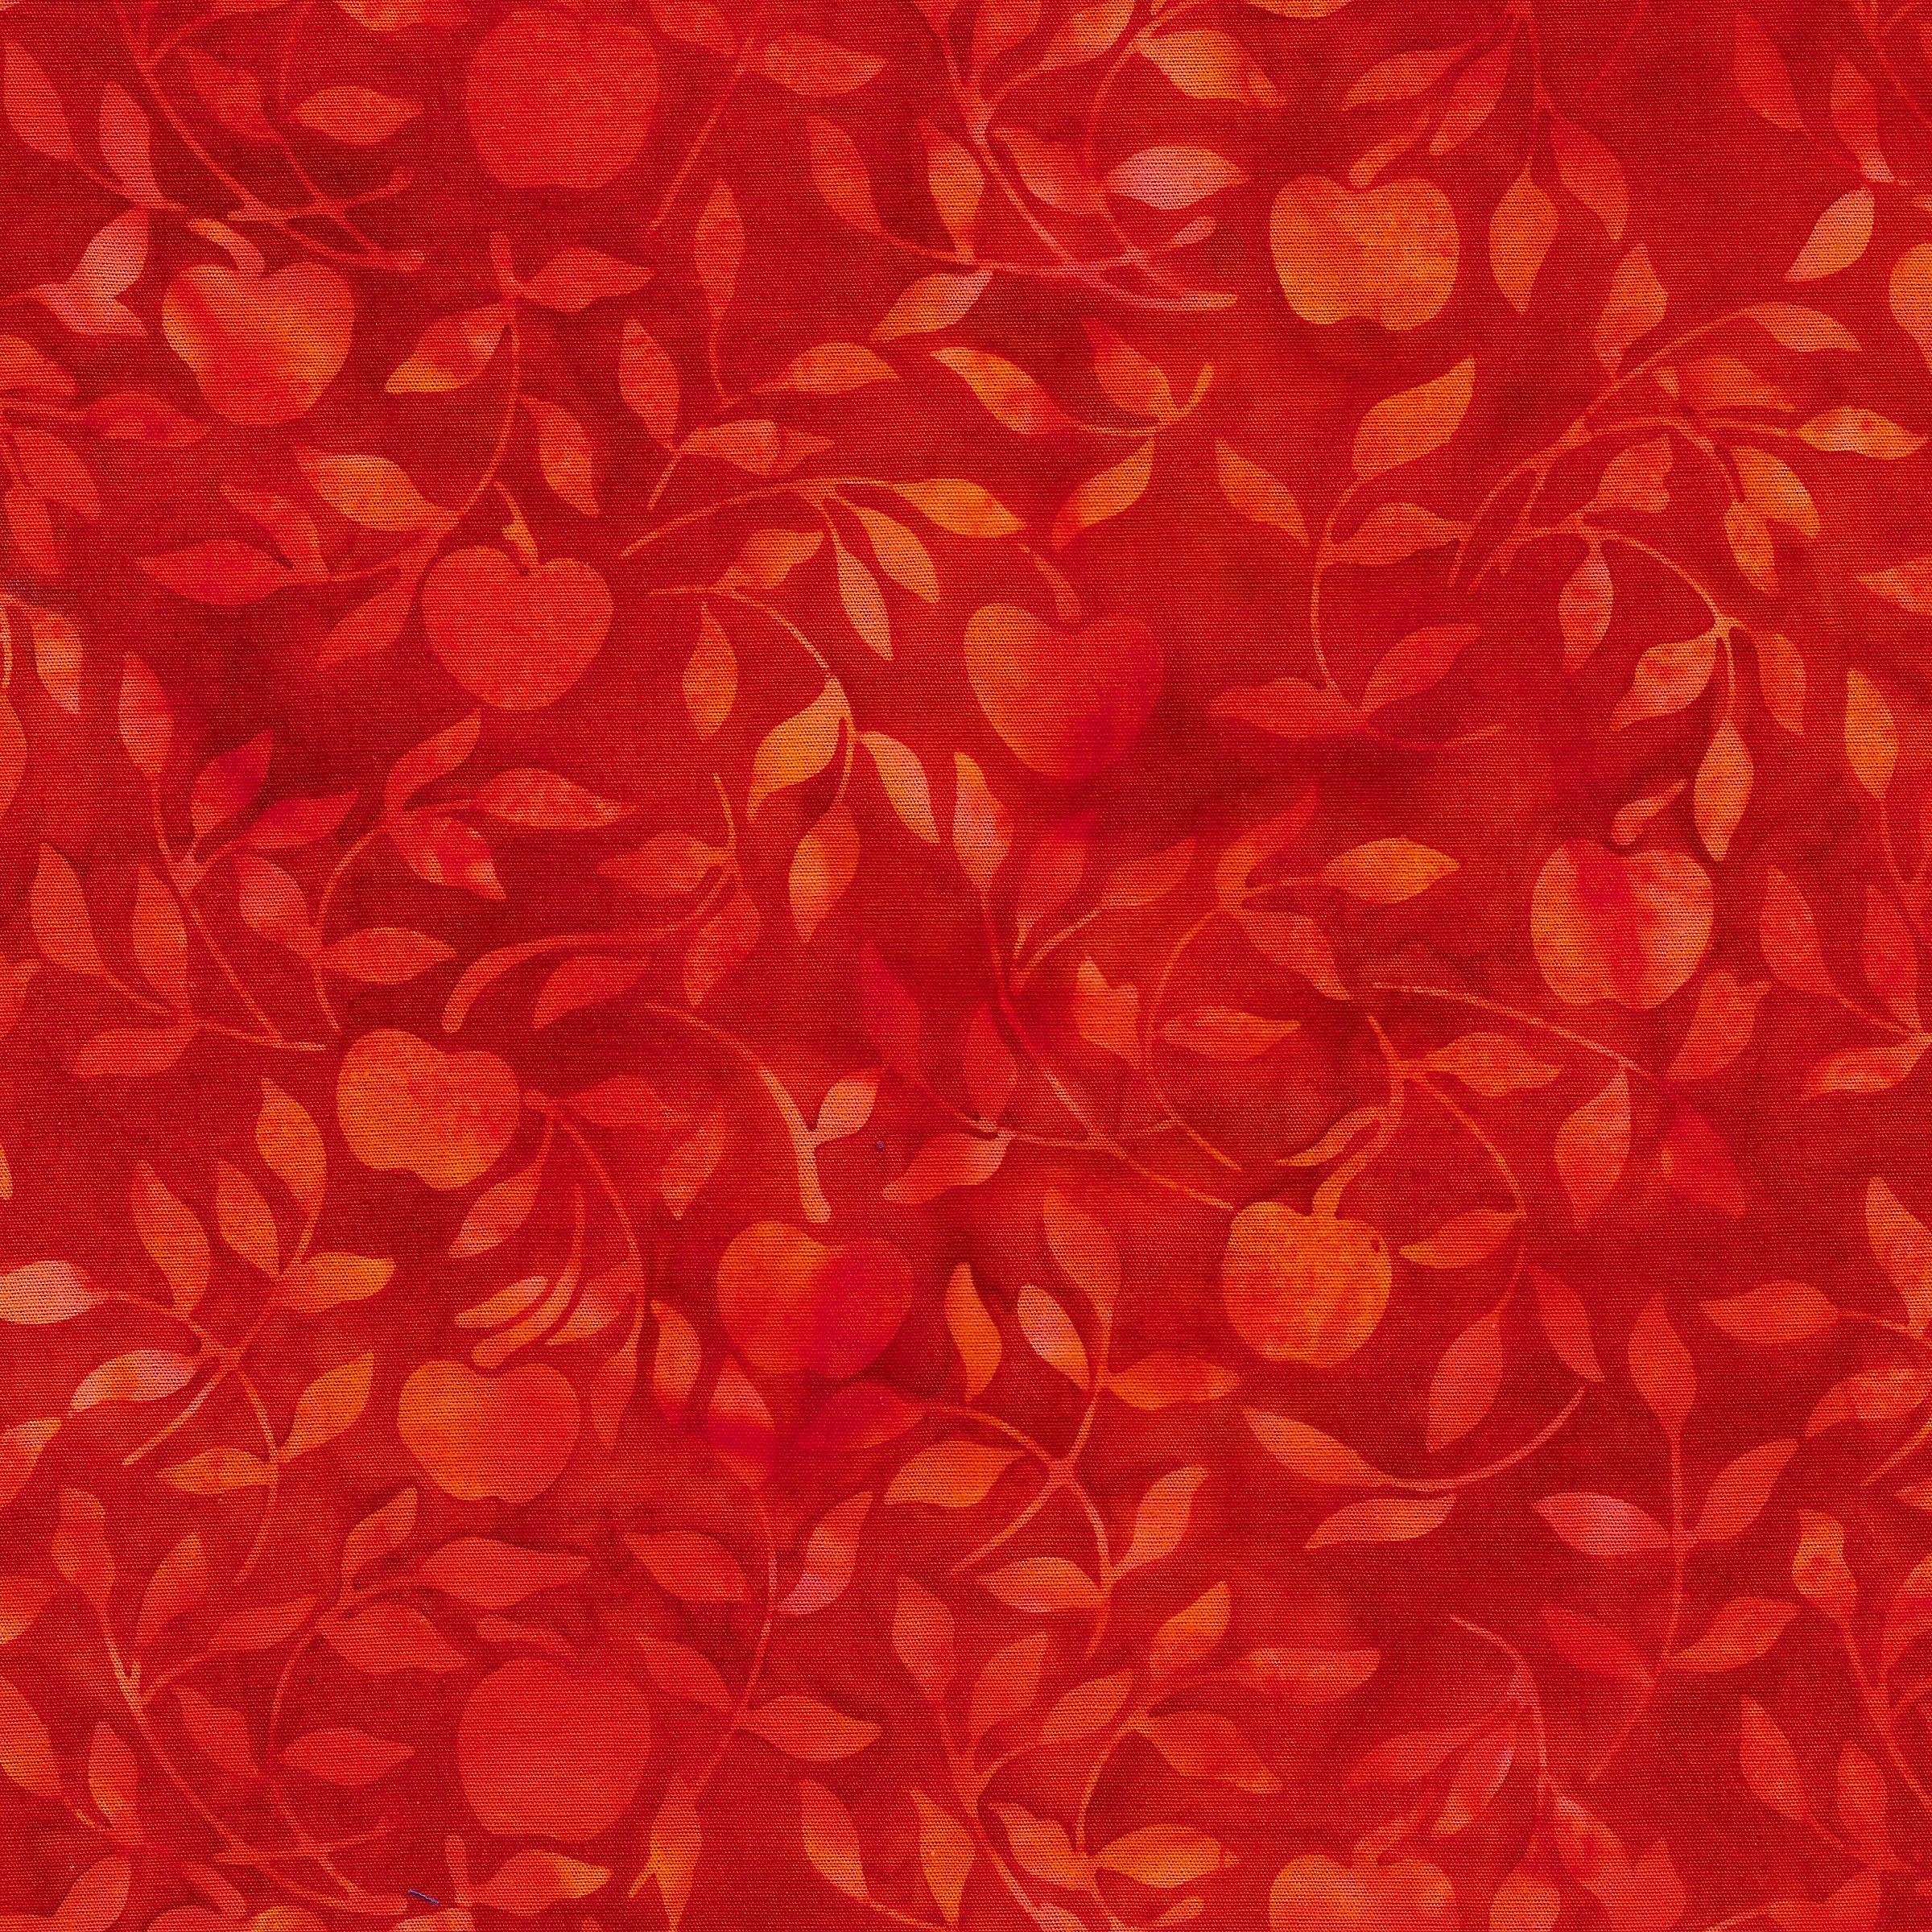 Batik, Cherries - Nasturtium